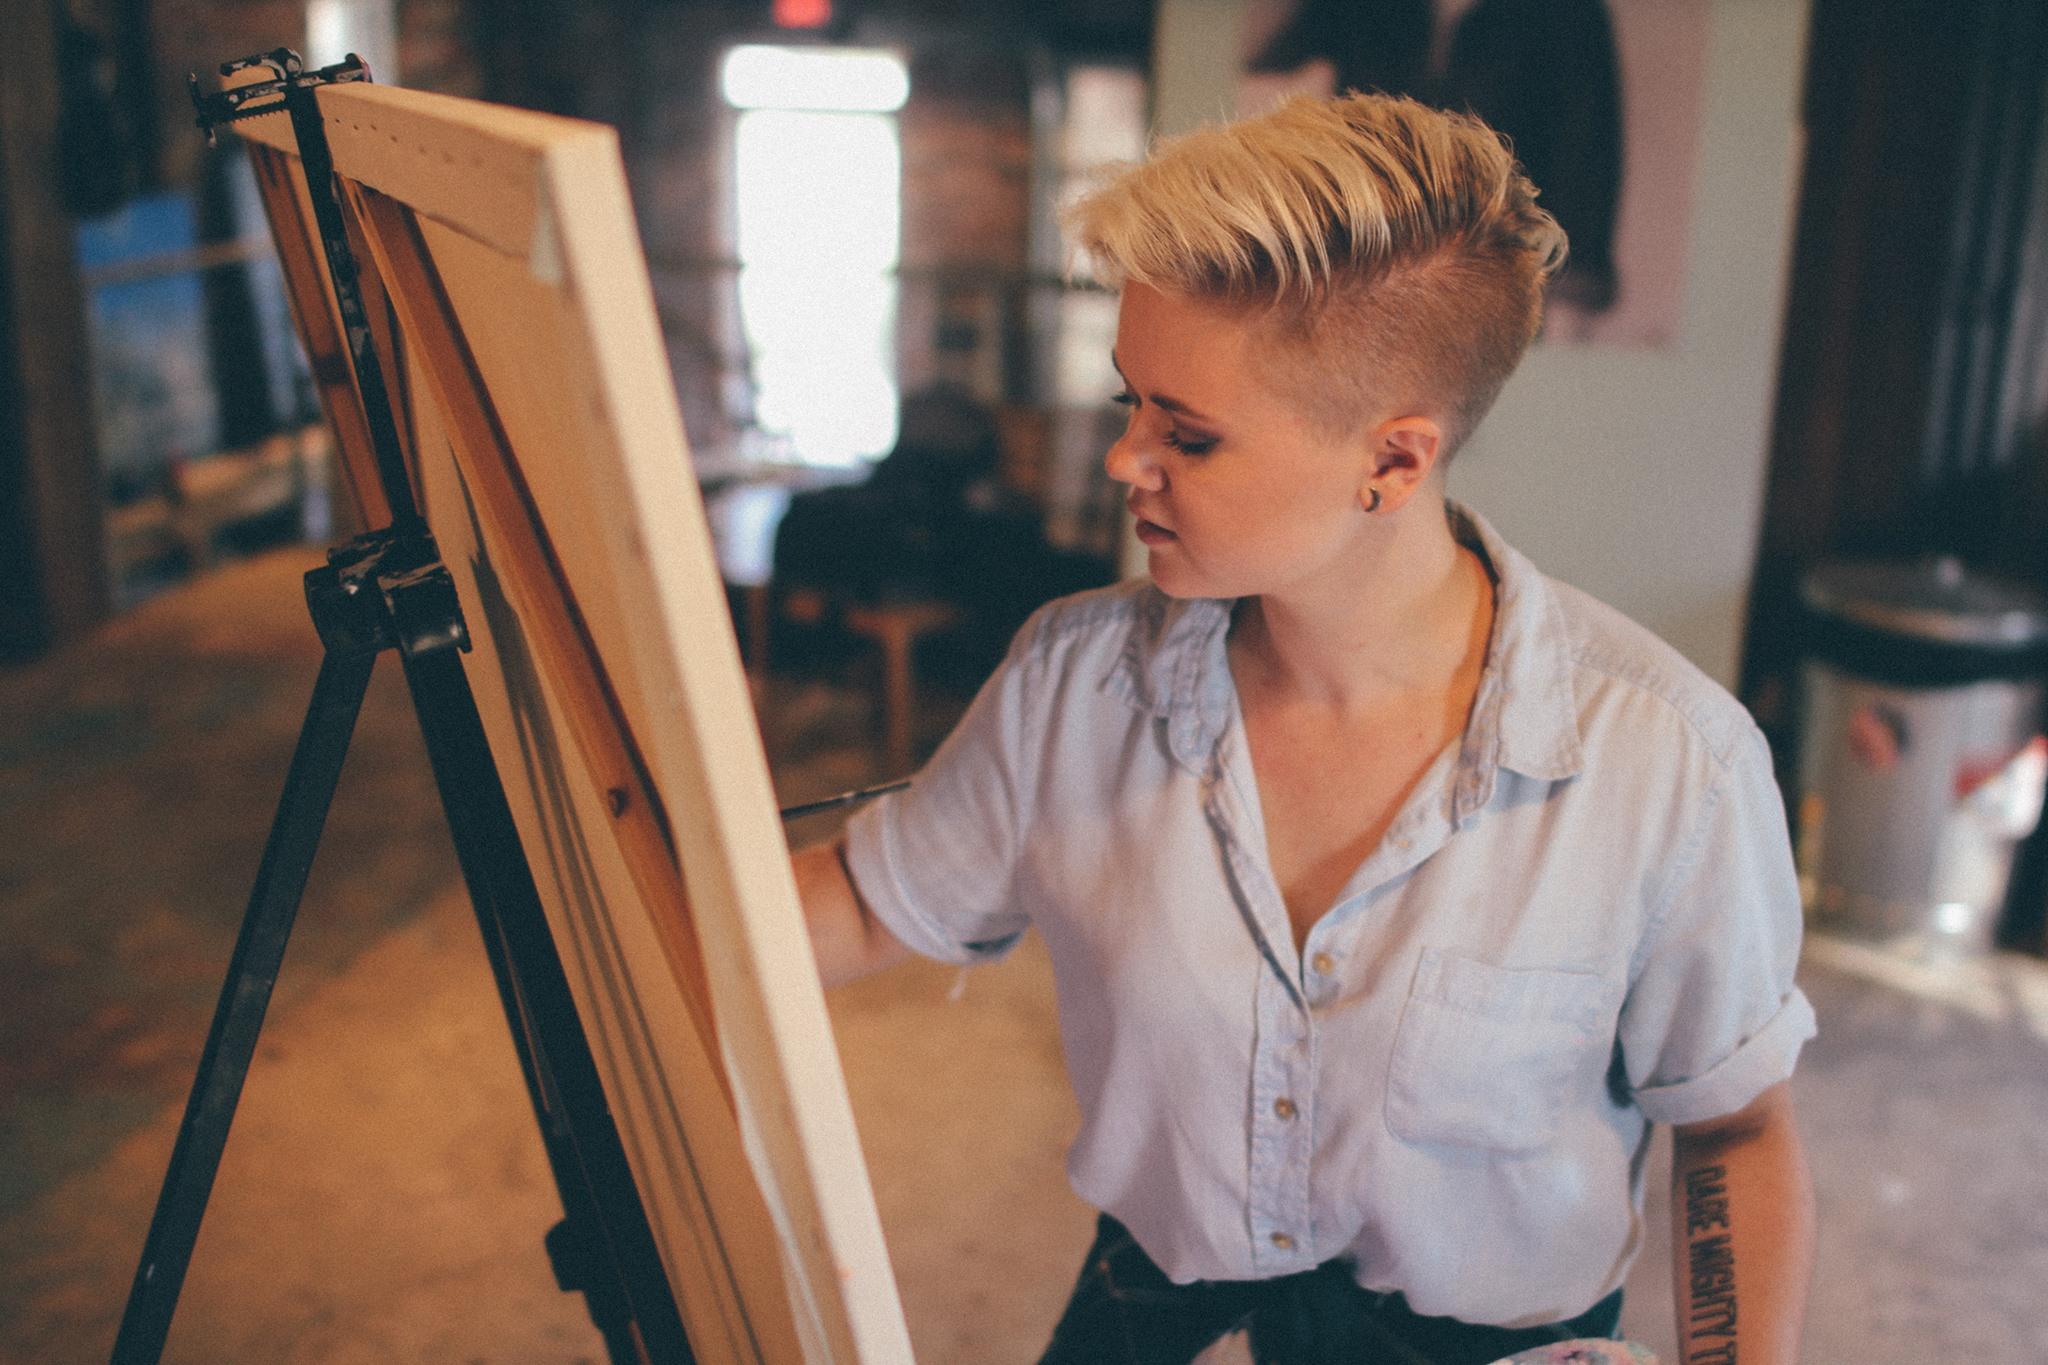 The beautiful lady herself, Emily Arwood, creating magic in her studio.